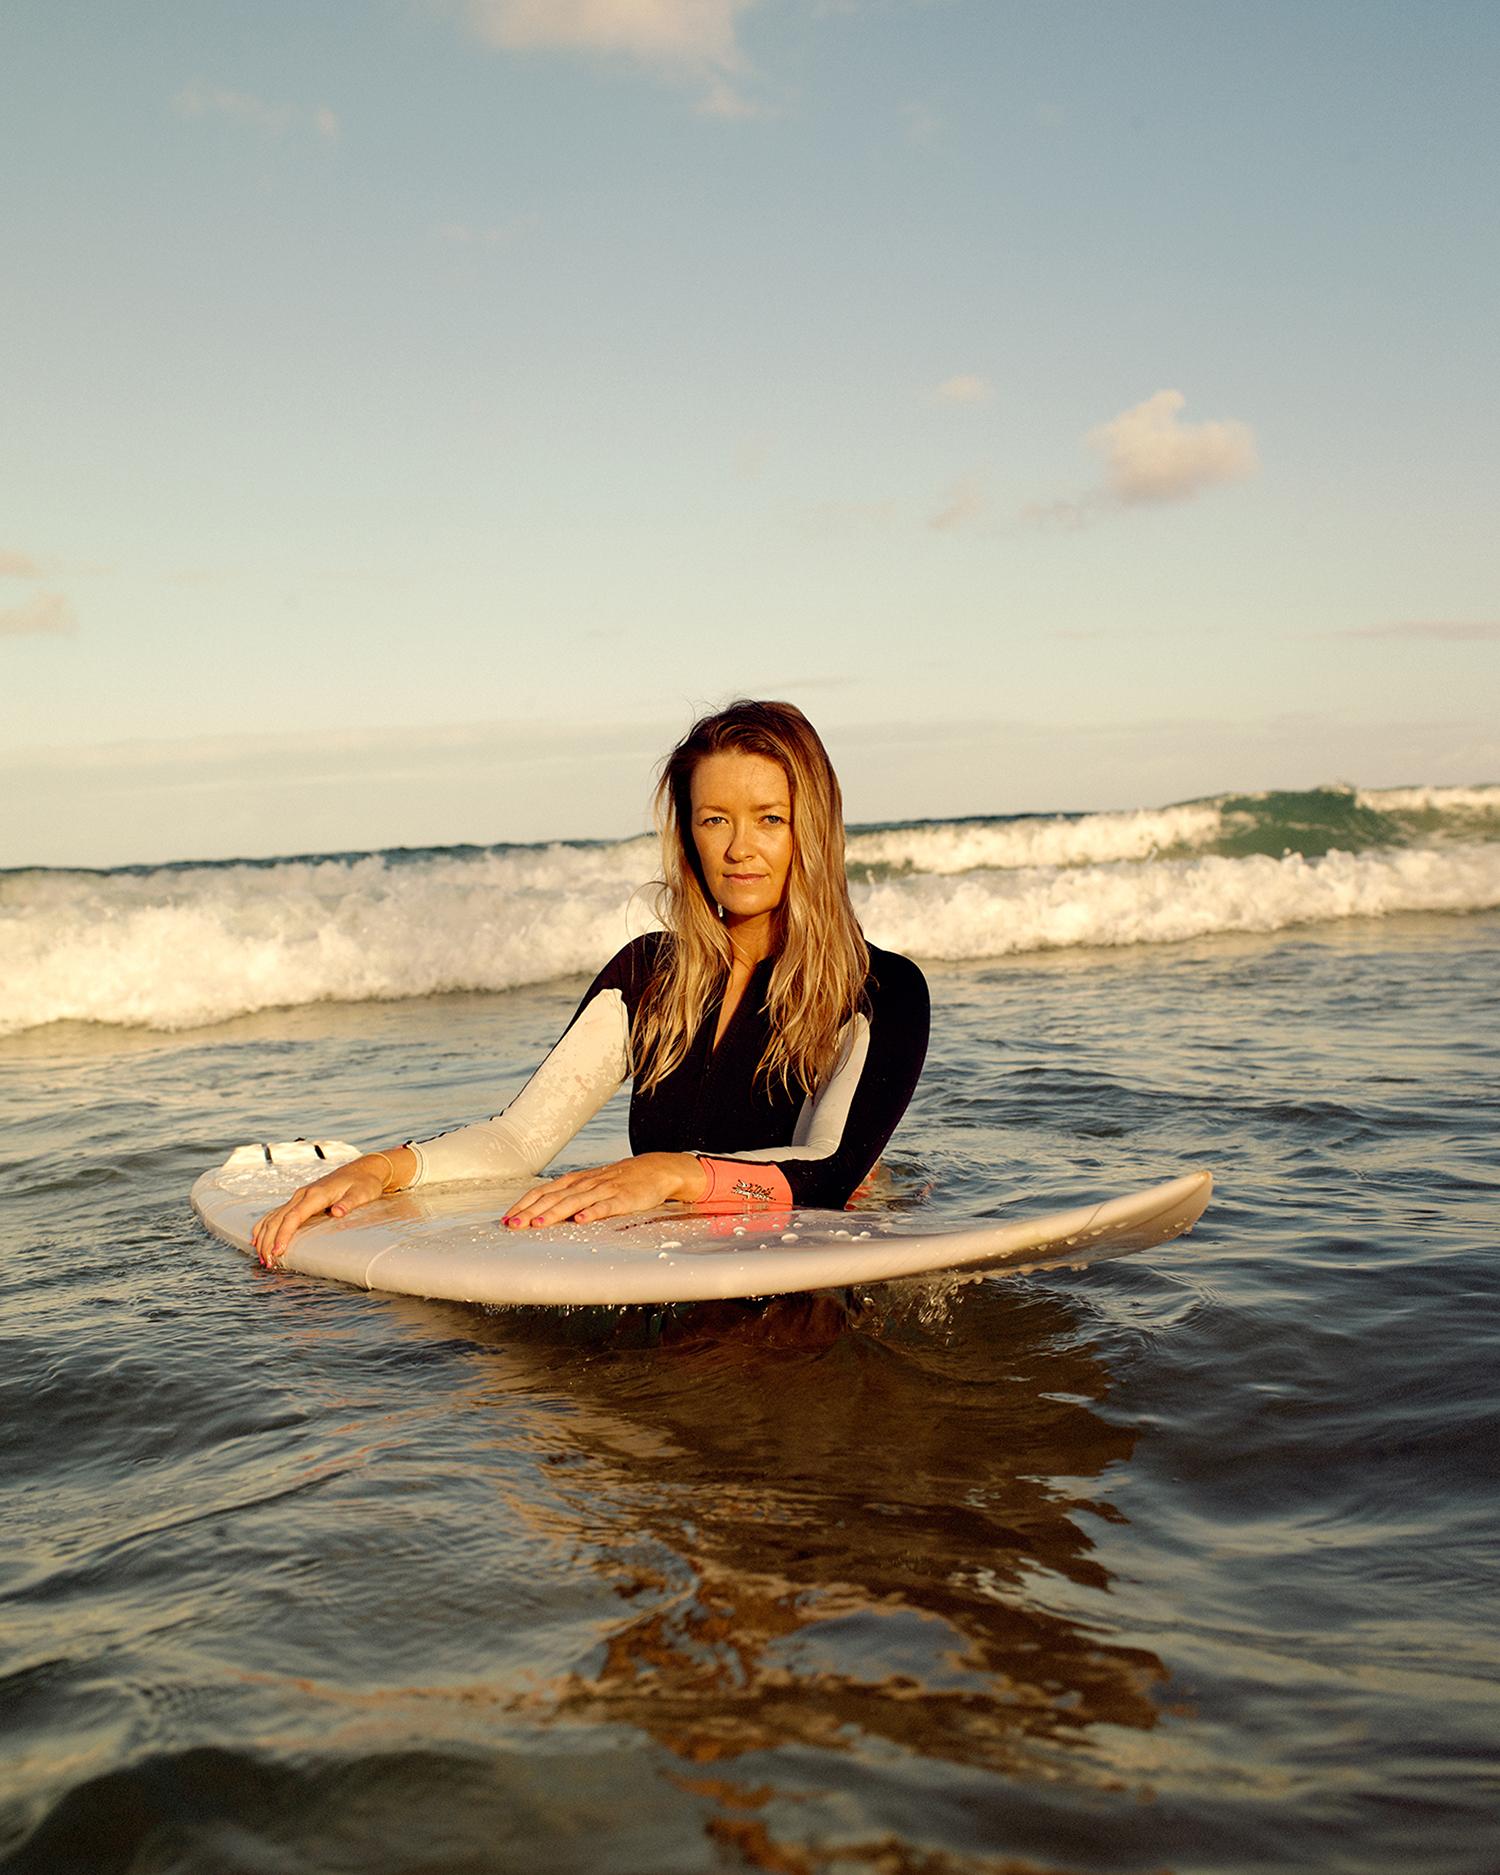 sam_wright_photo_photography_photographer_surfer_sea_ocean_woman_australia_england_america.jpg